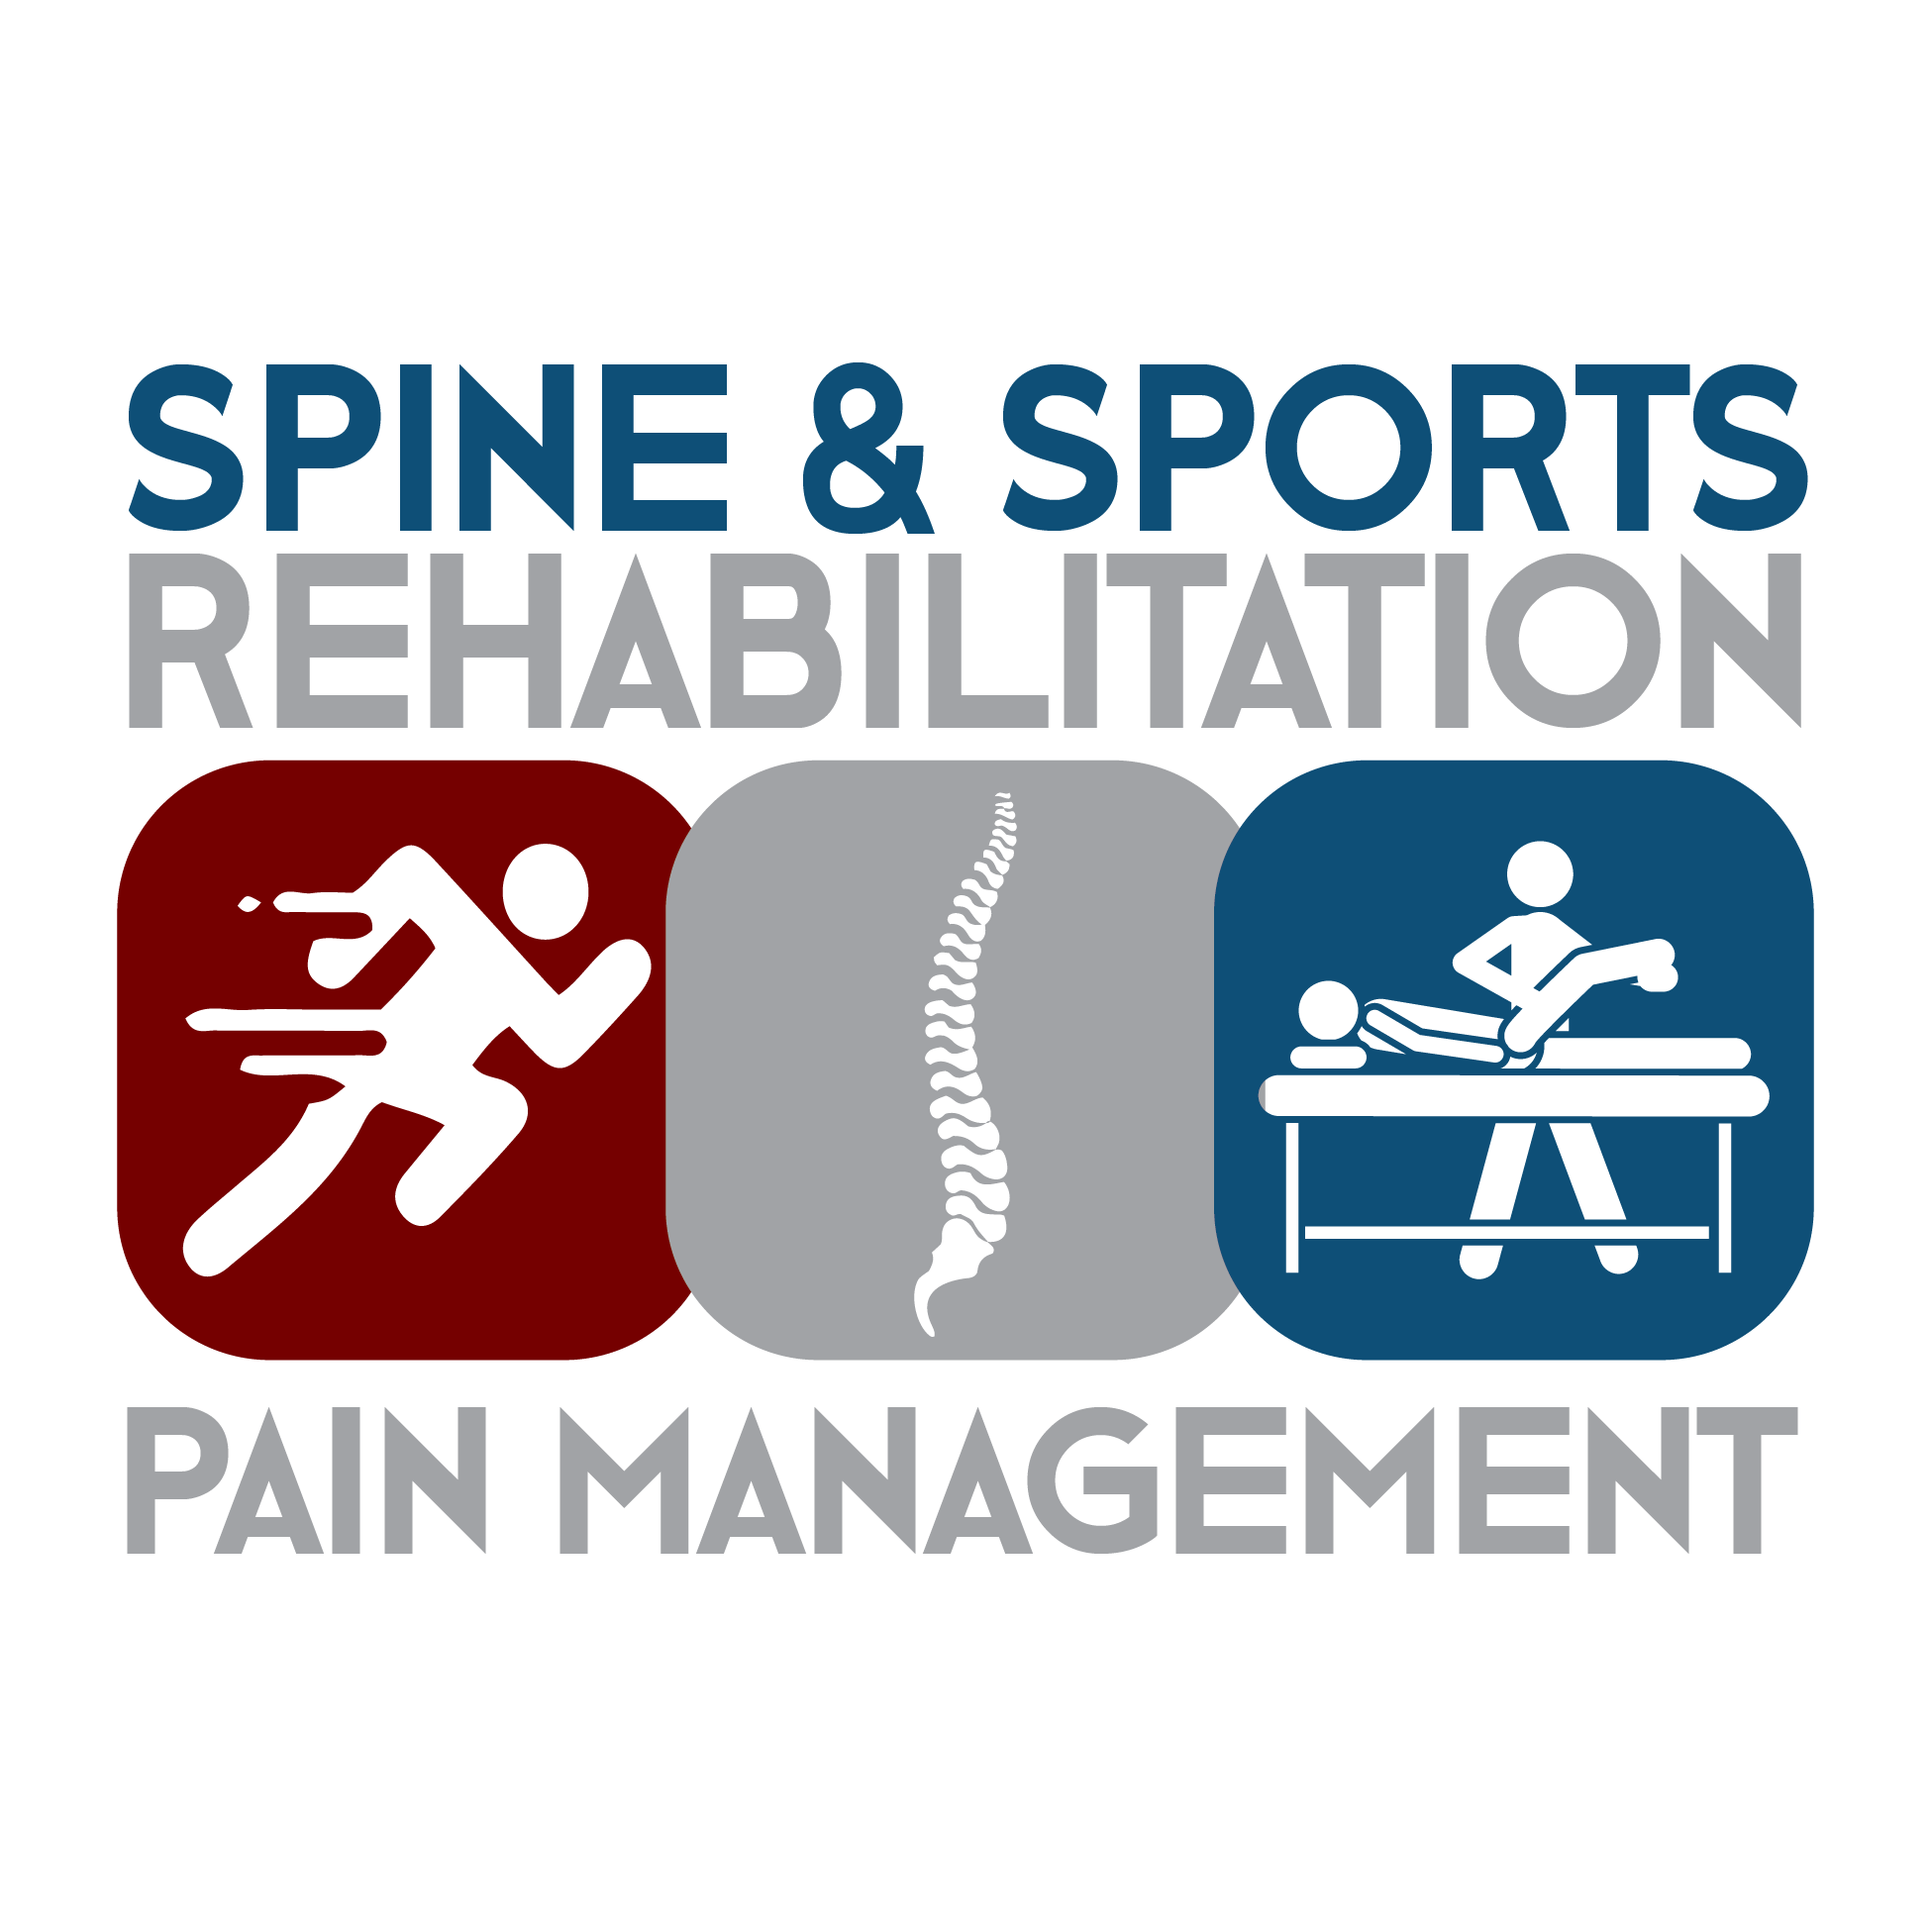 Spine & Sports Rehabilitation Pain Management